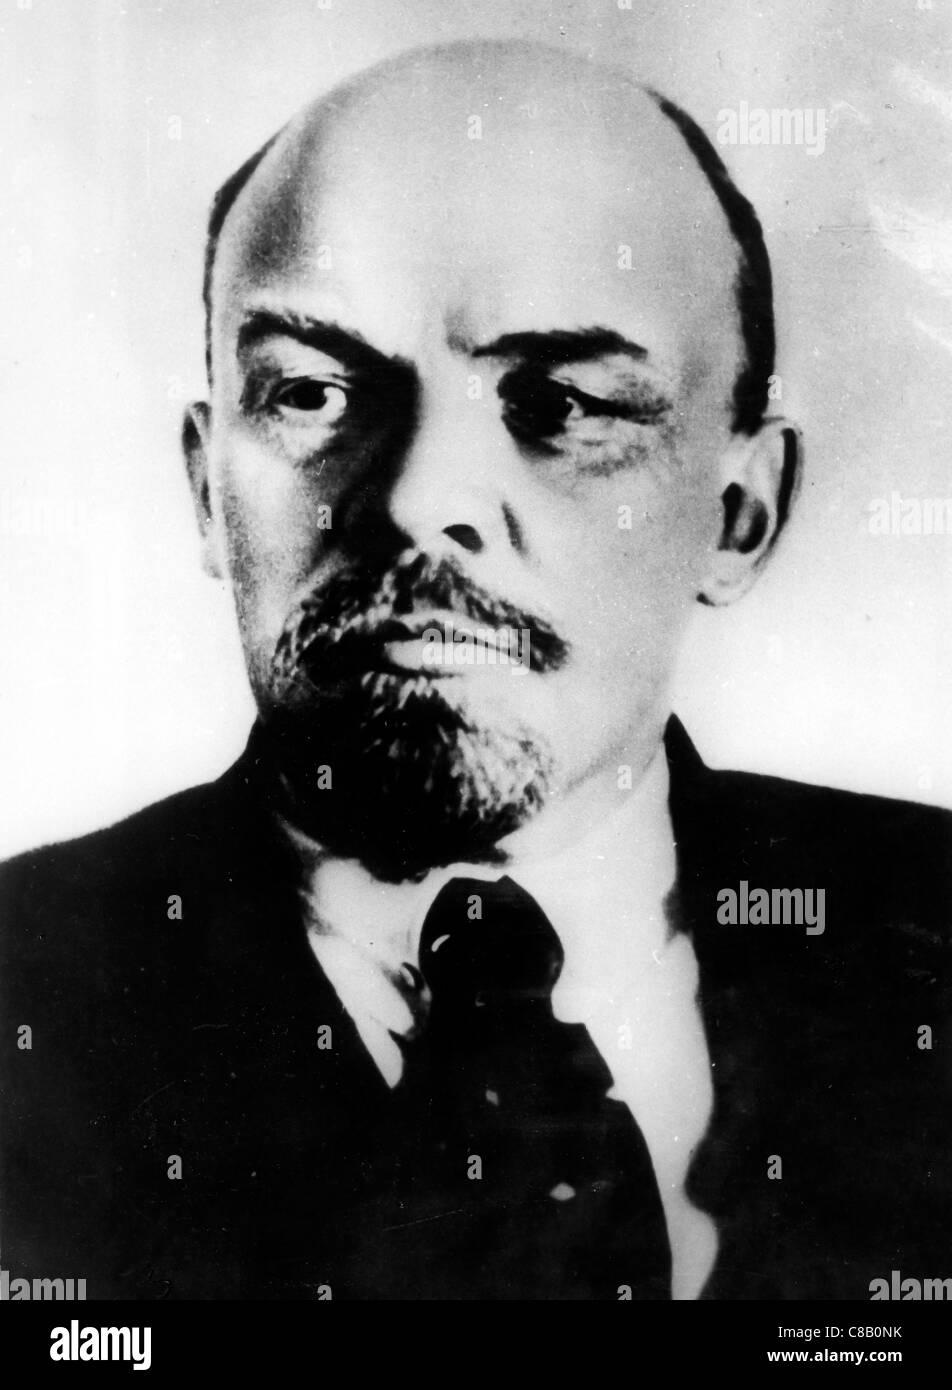 Vladimir Ilyich Ulyanov ' Lenin' - Stock Image